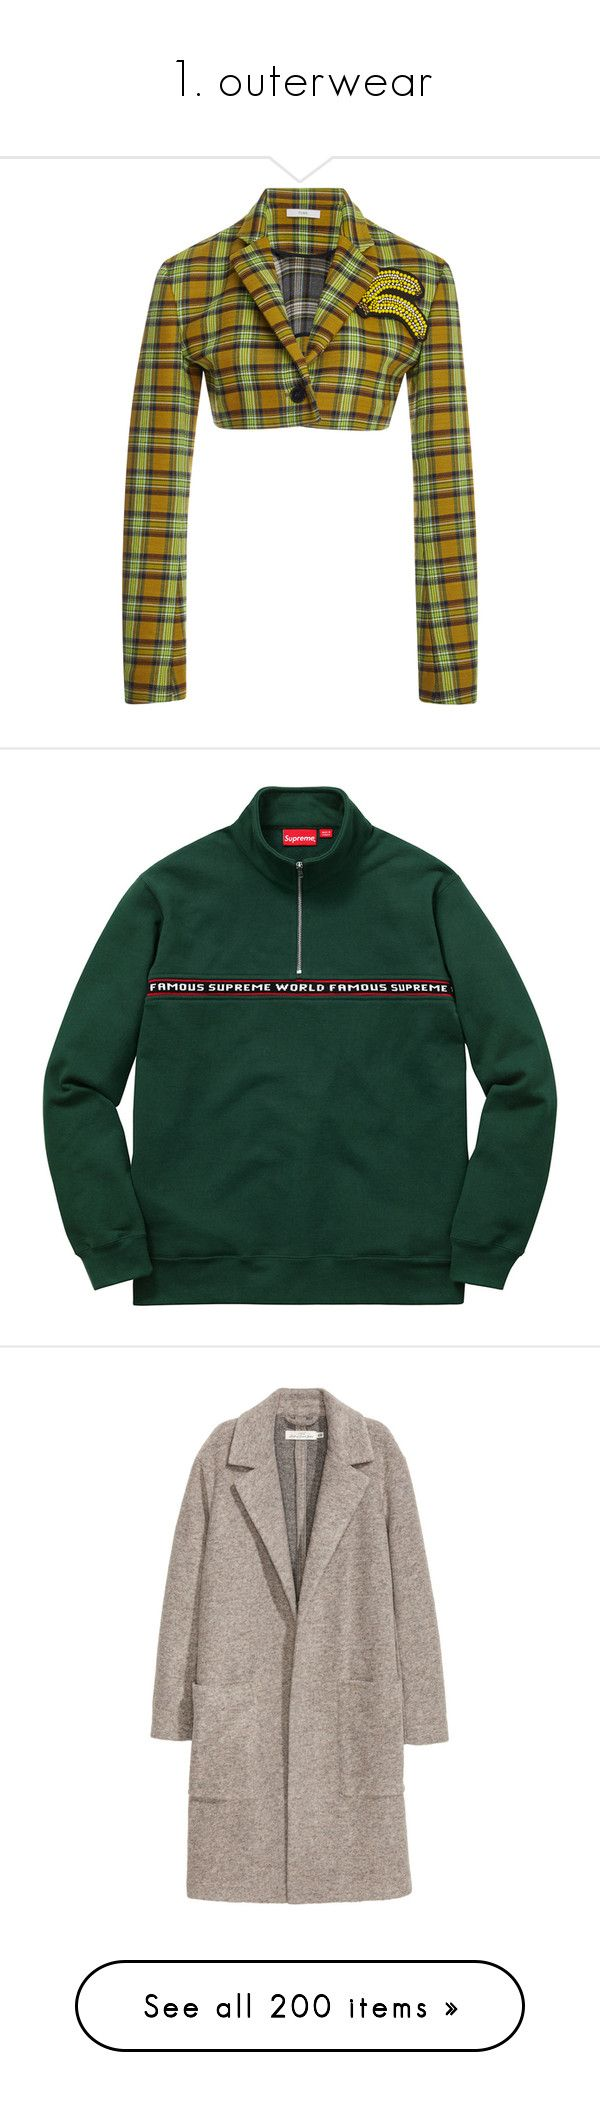 """1. outerwear"" by niya-gurl ❤ liked on Polyvore featuring outerwear, jackets, blazer, plaid, bolero jackets, white blazer jacket, white bolero, cropped bolero, tartan jacket and men's fashion"